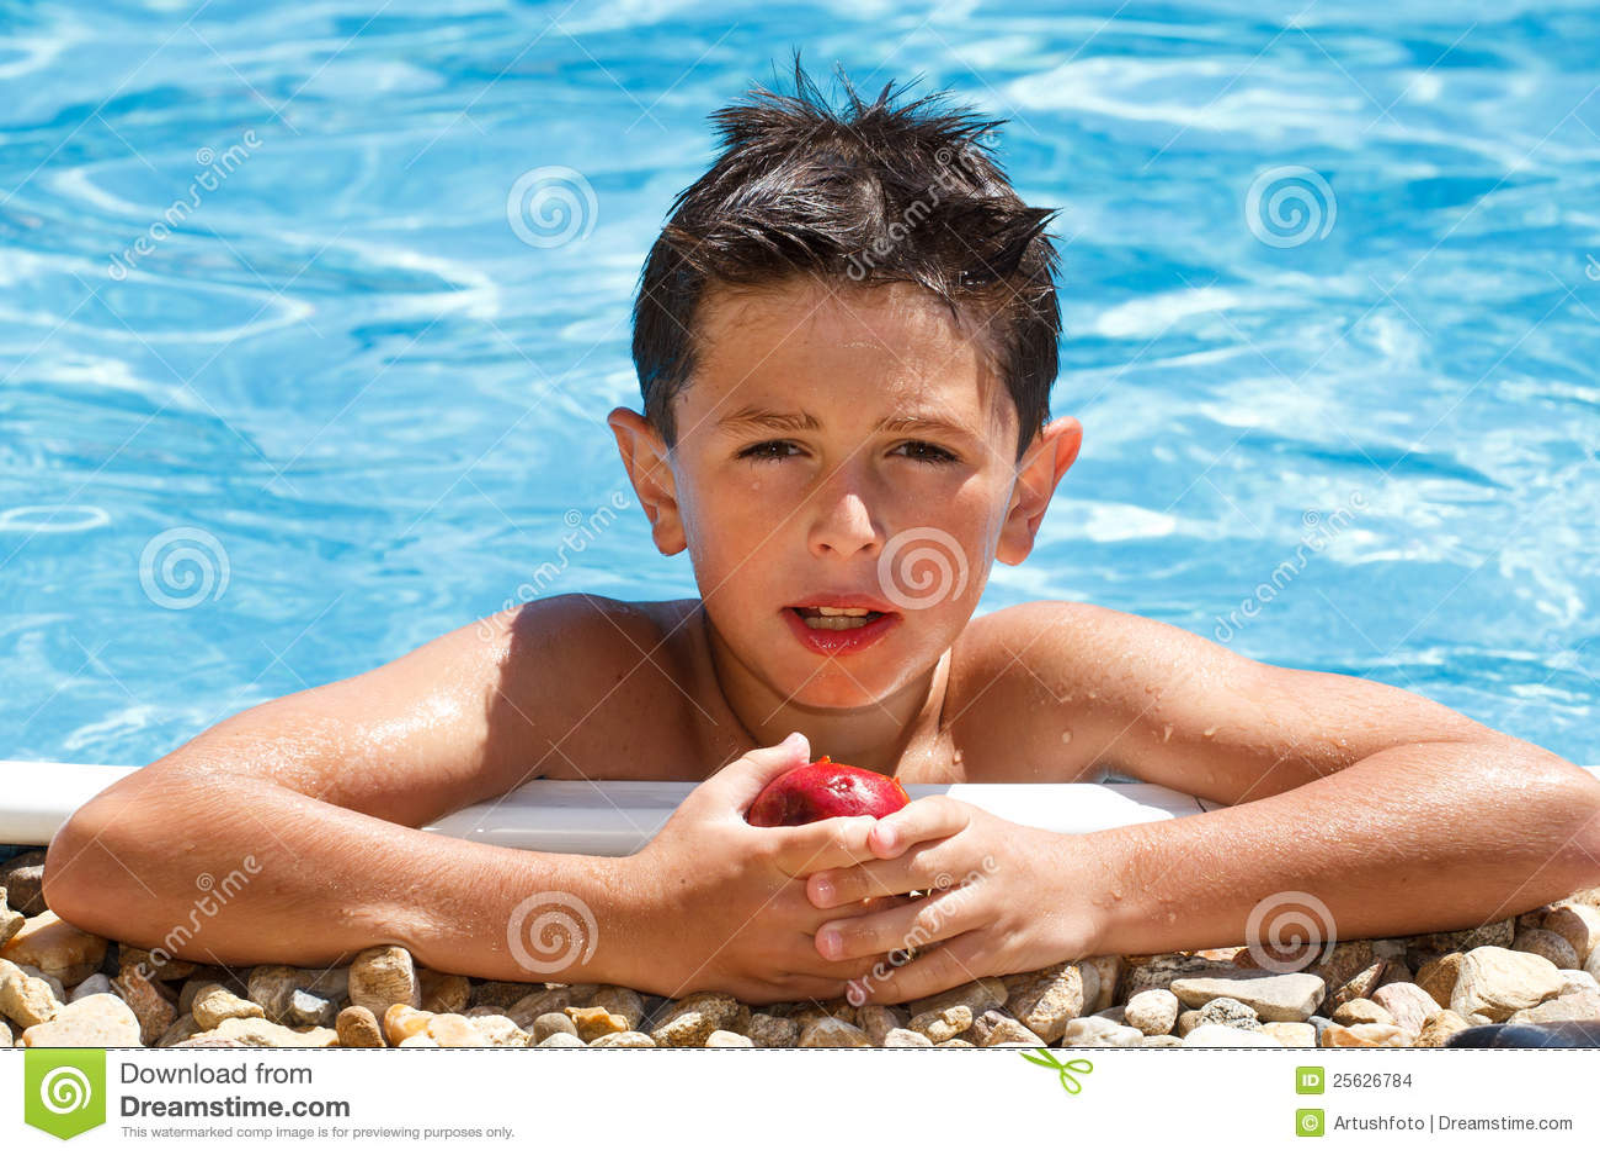 Boy Eating Fruit In Swimming Pool Stock Photo - Image of ...